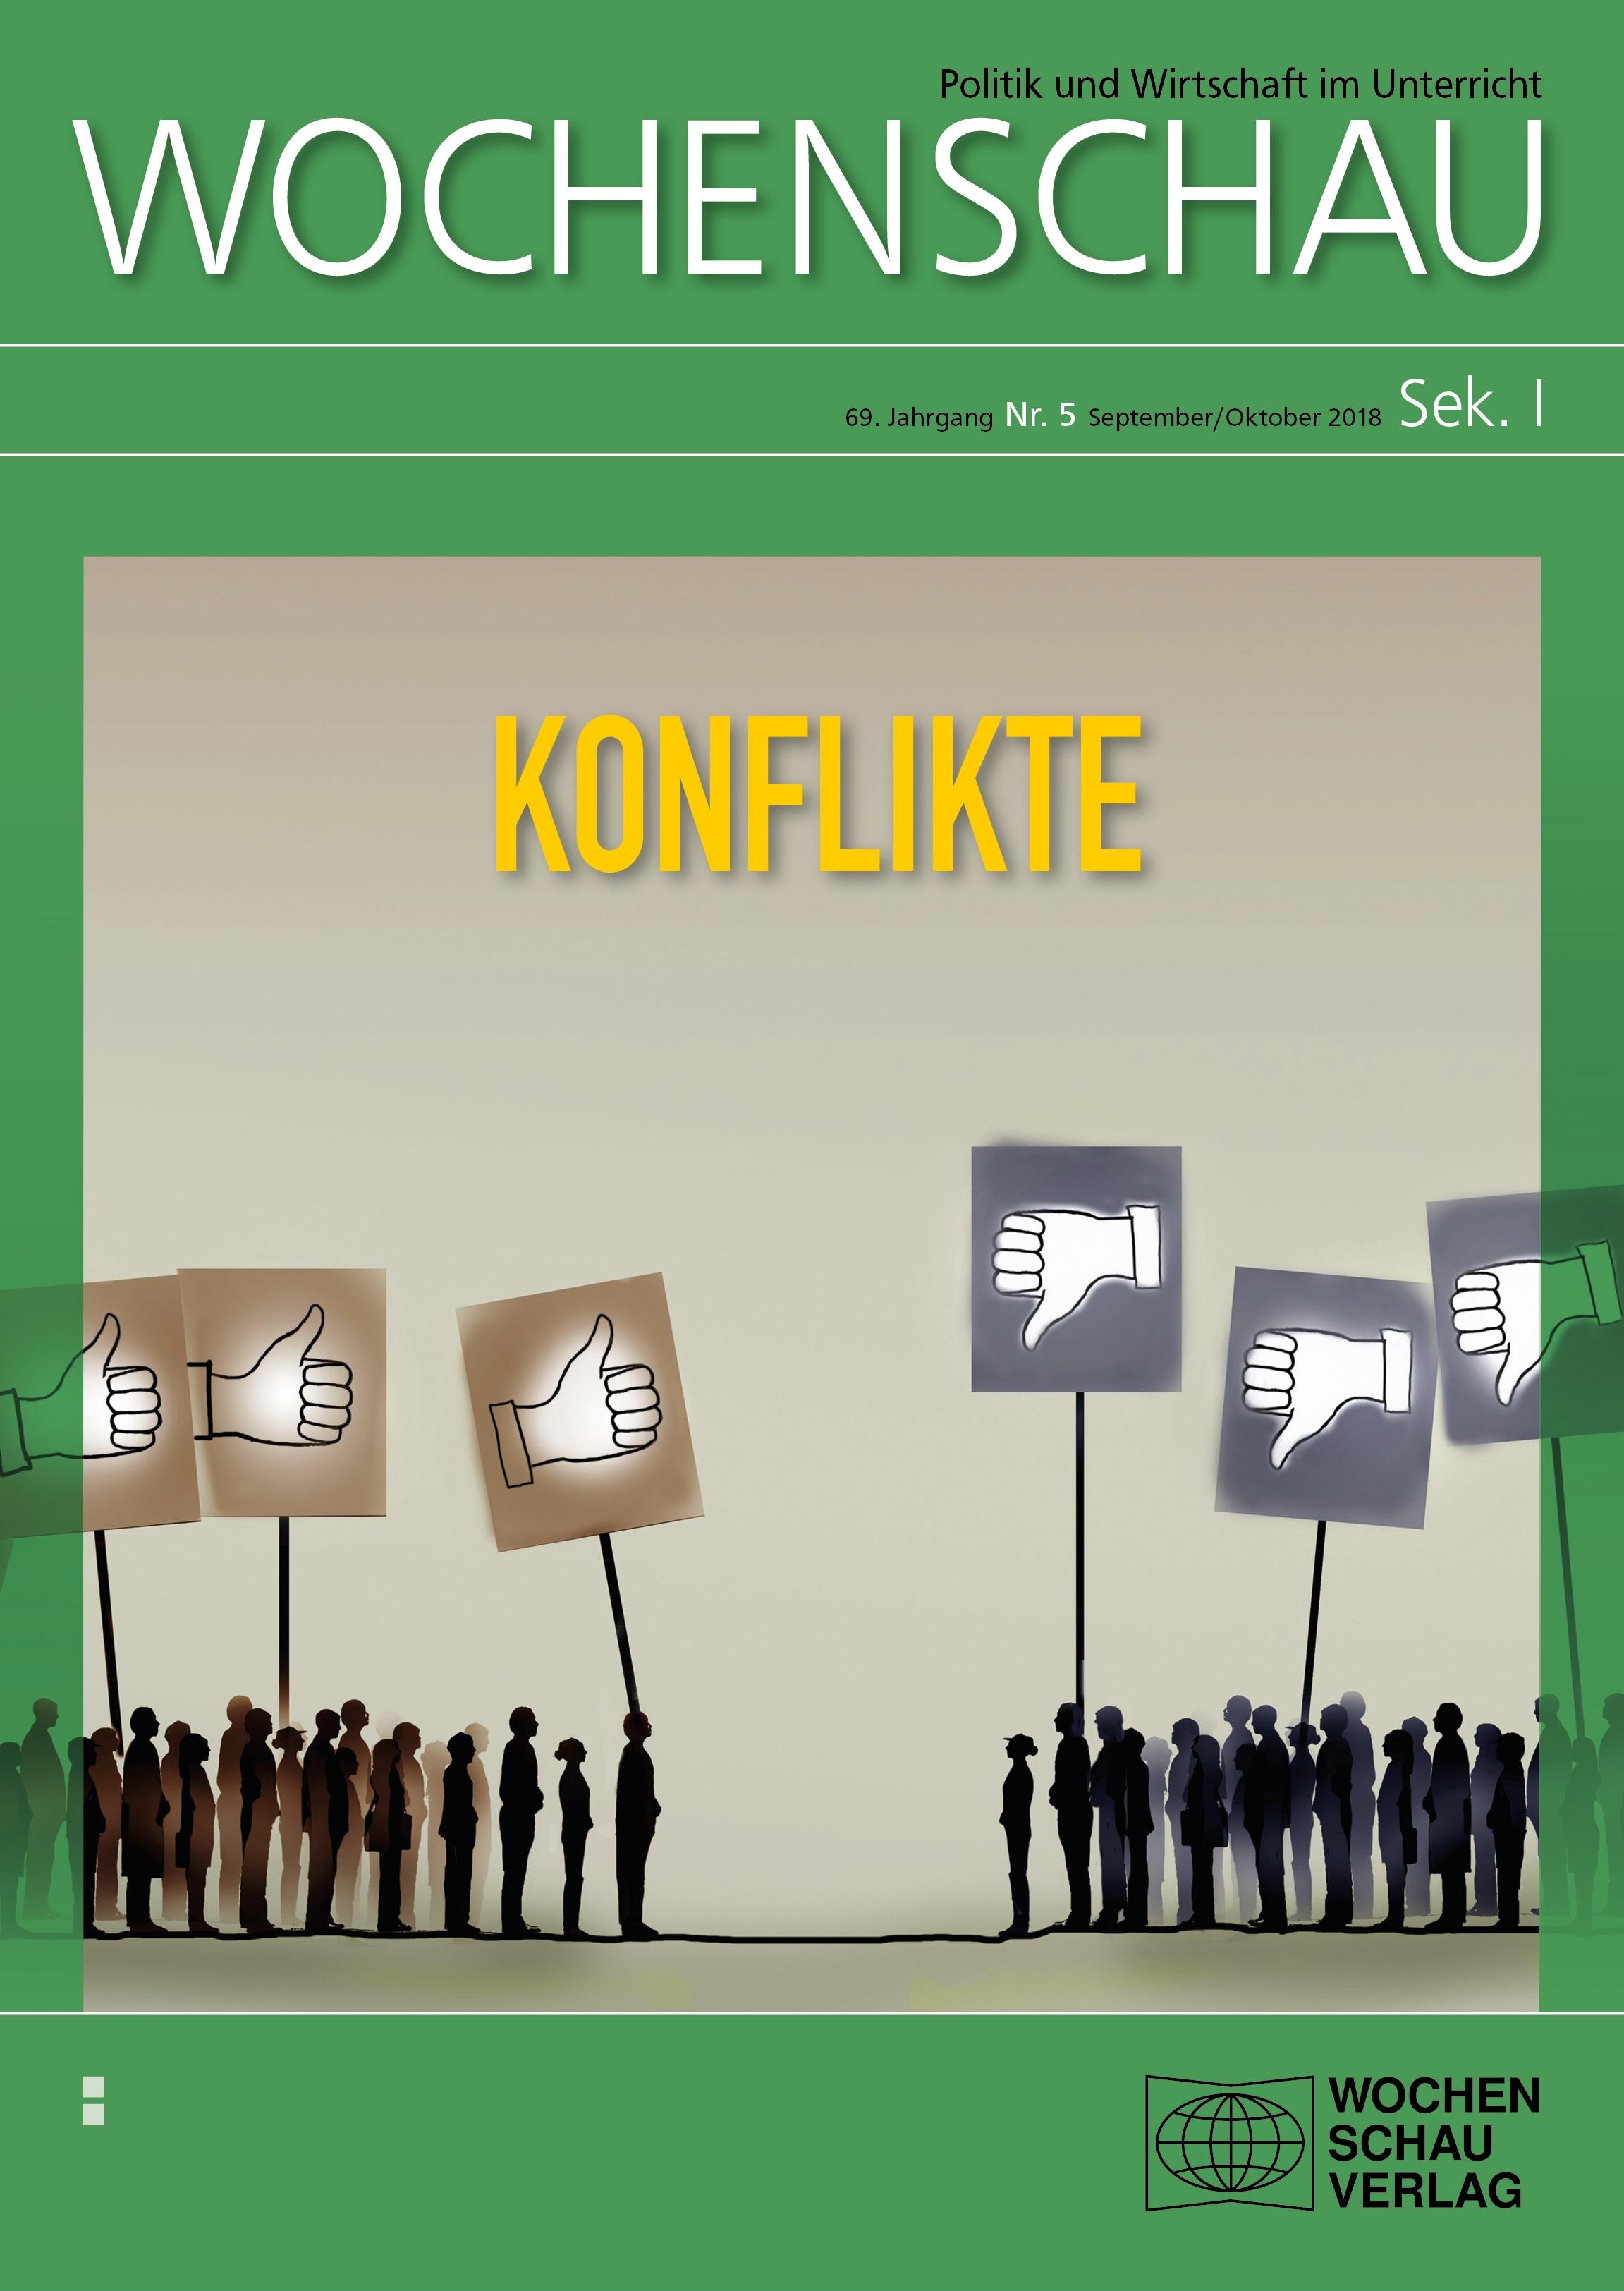 Konfliktfelder, Jugend, Gesellschaft, Konflikt, Konflikte